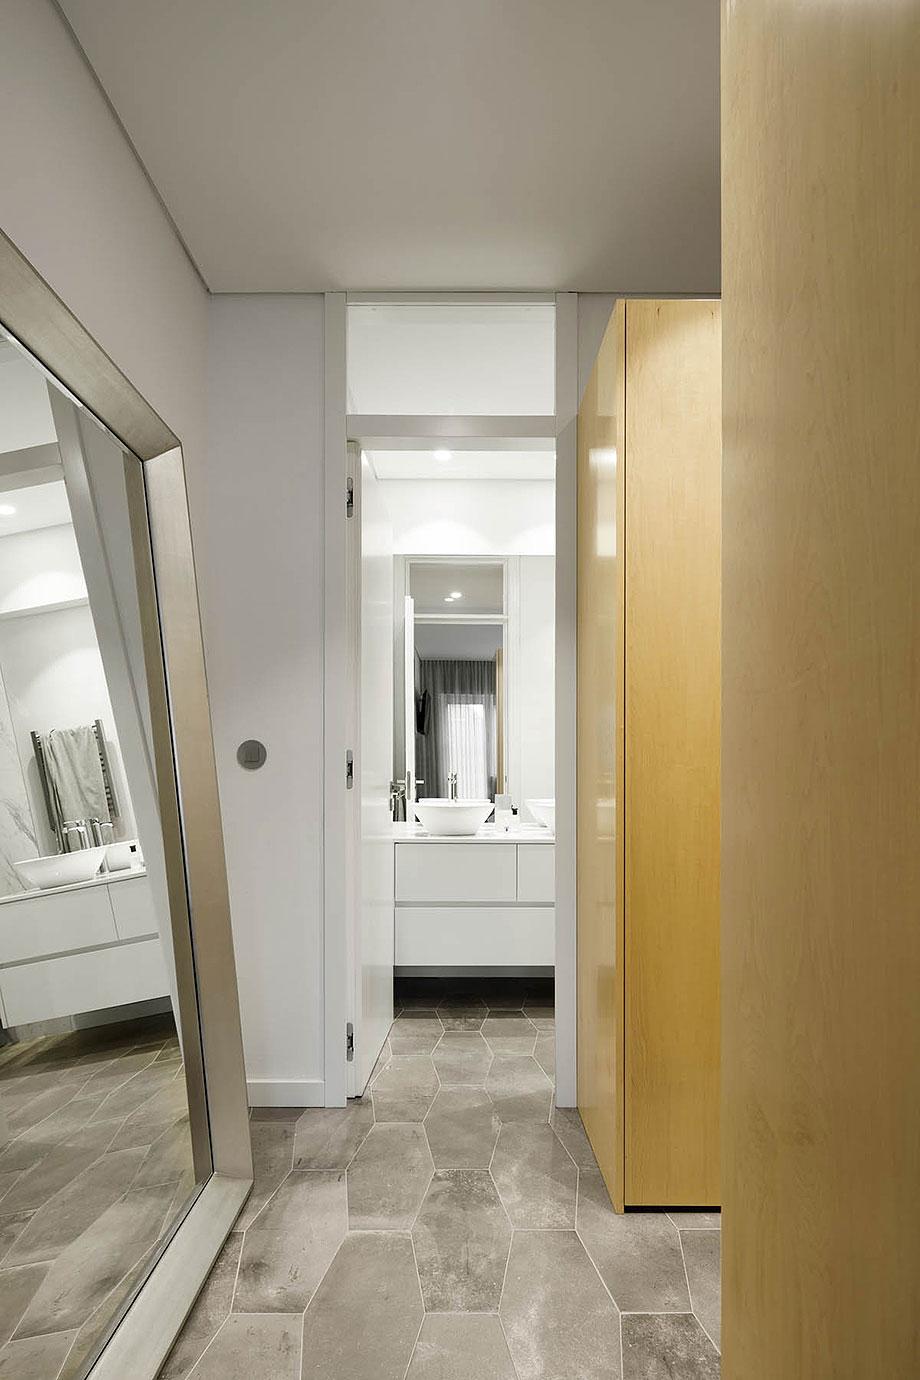 apartamento en oporto por paulo moreira architectures (19) - foto ivo tavares